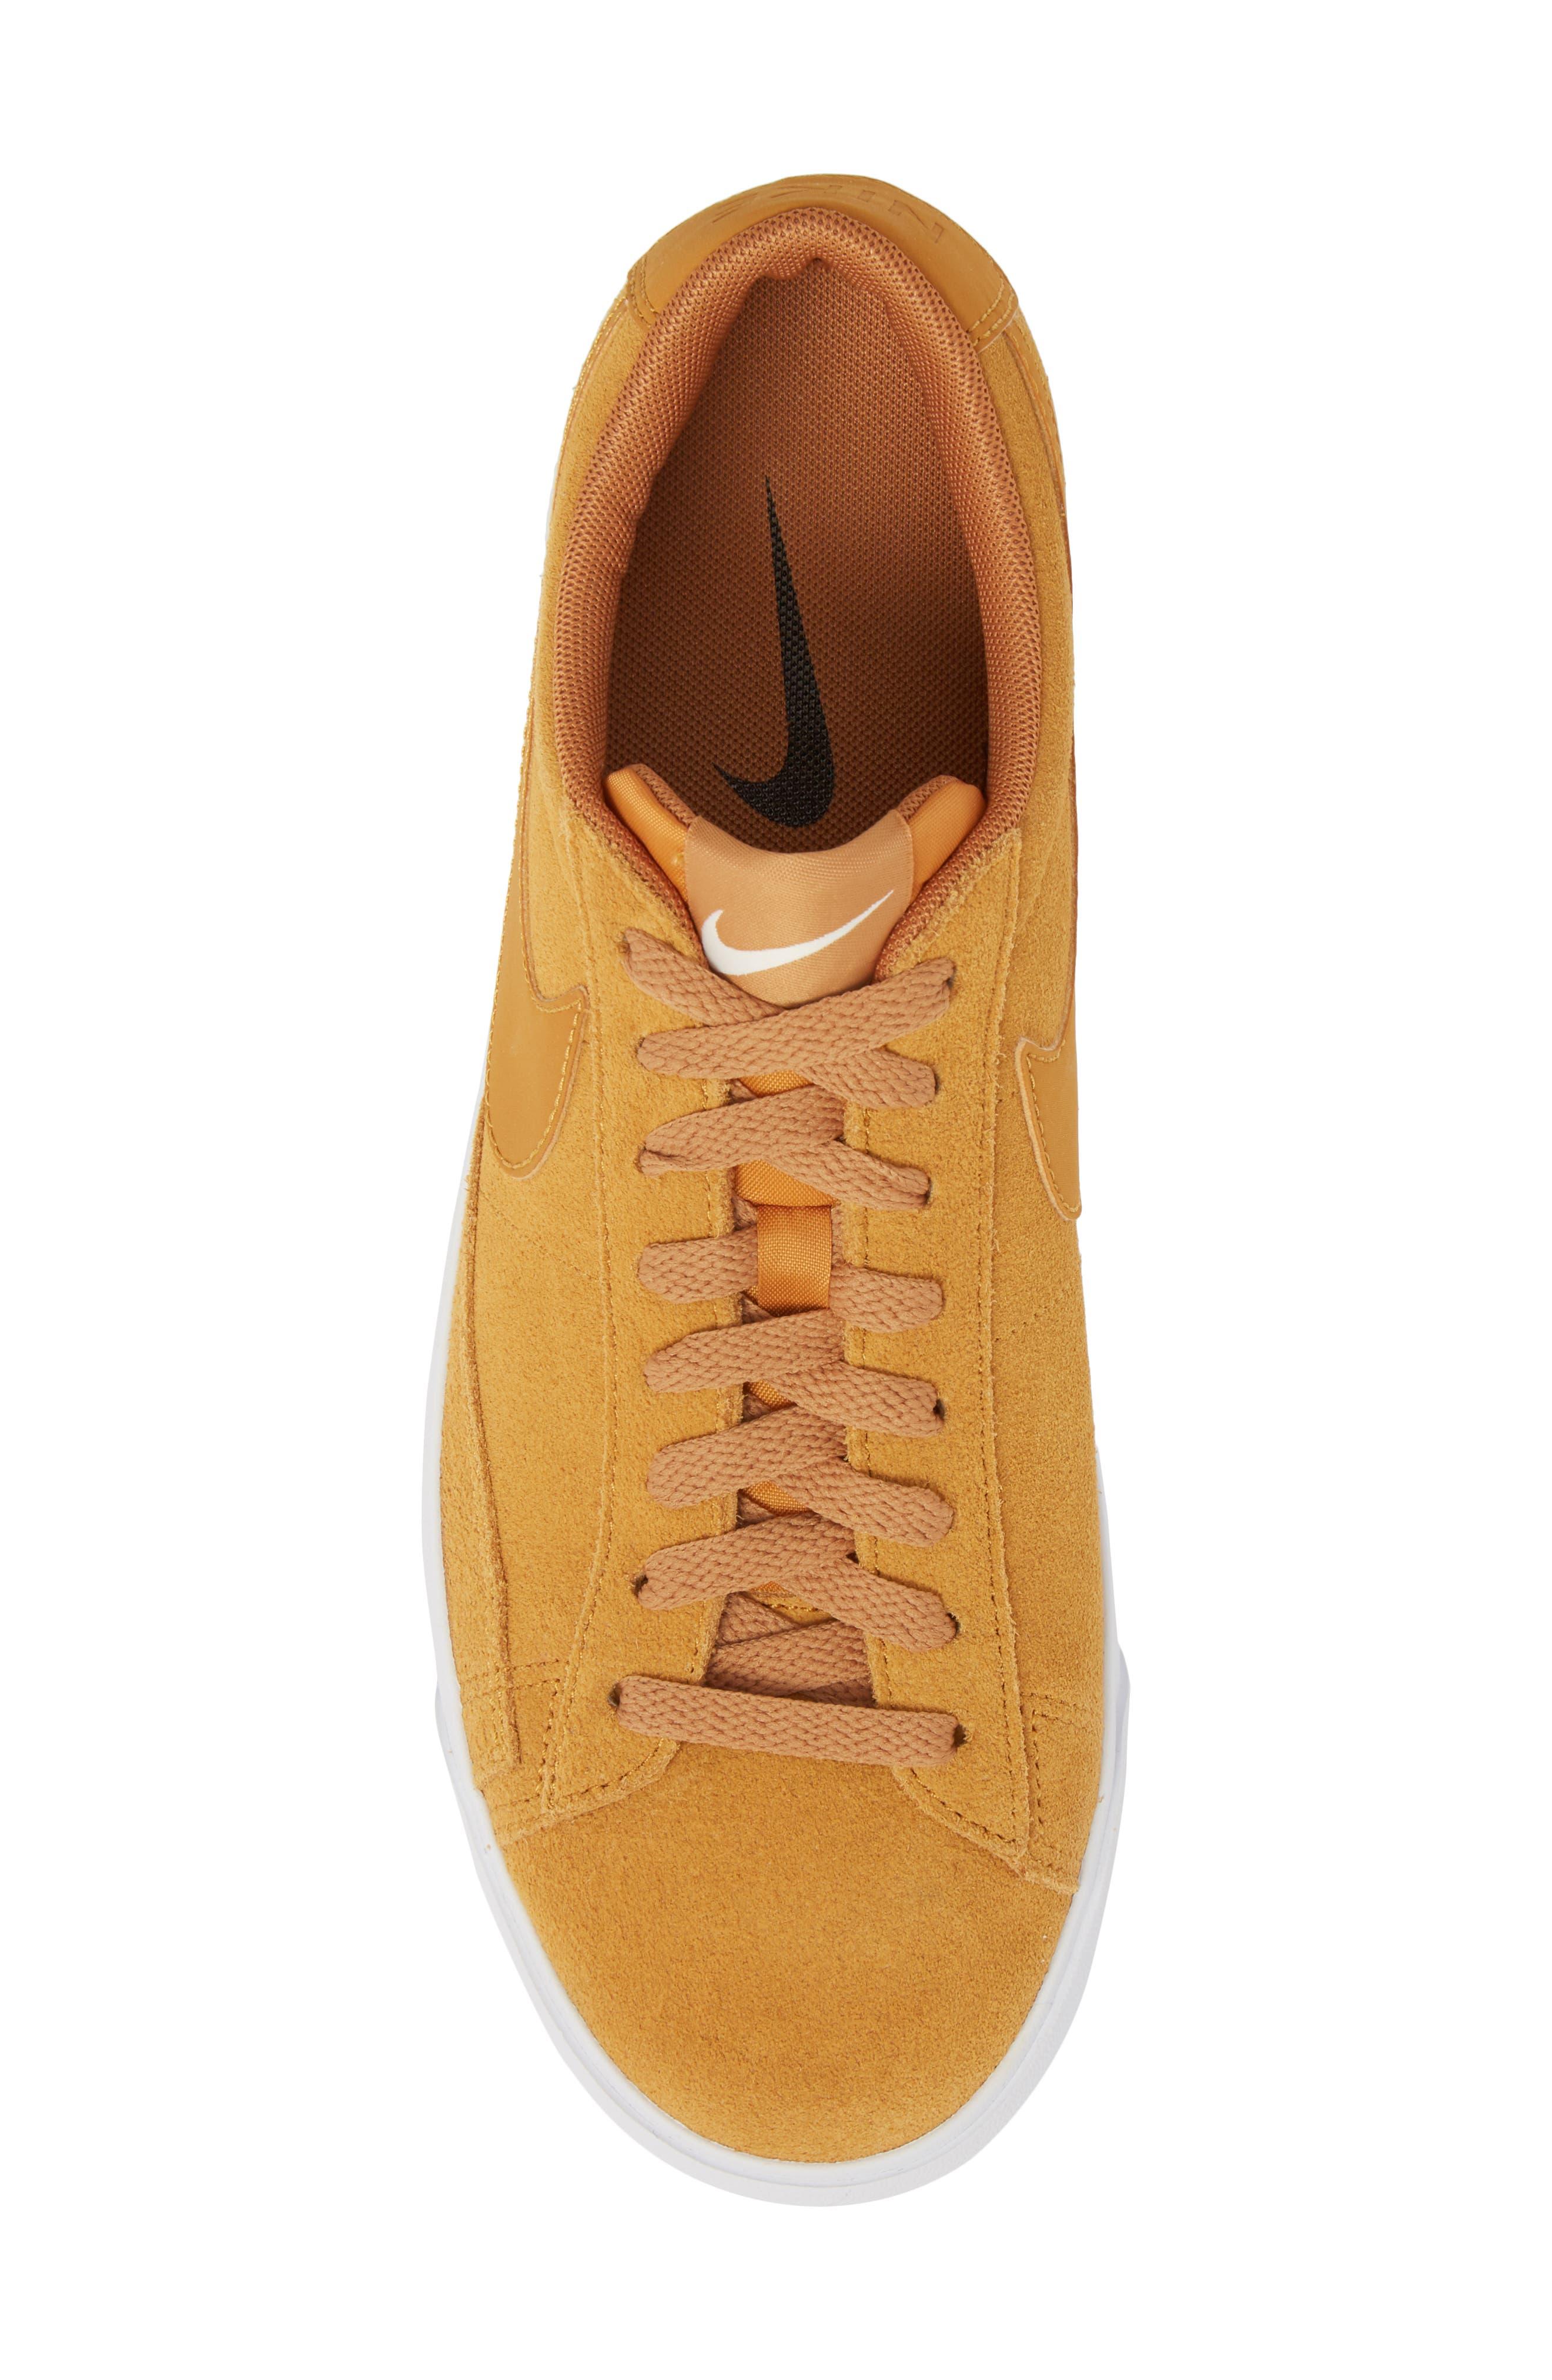 Blazer Low Suede Sneaker,                             Alternate thumbnail 5, color,                             260